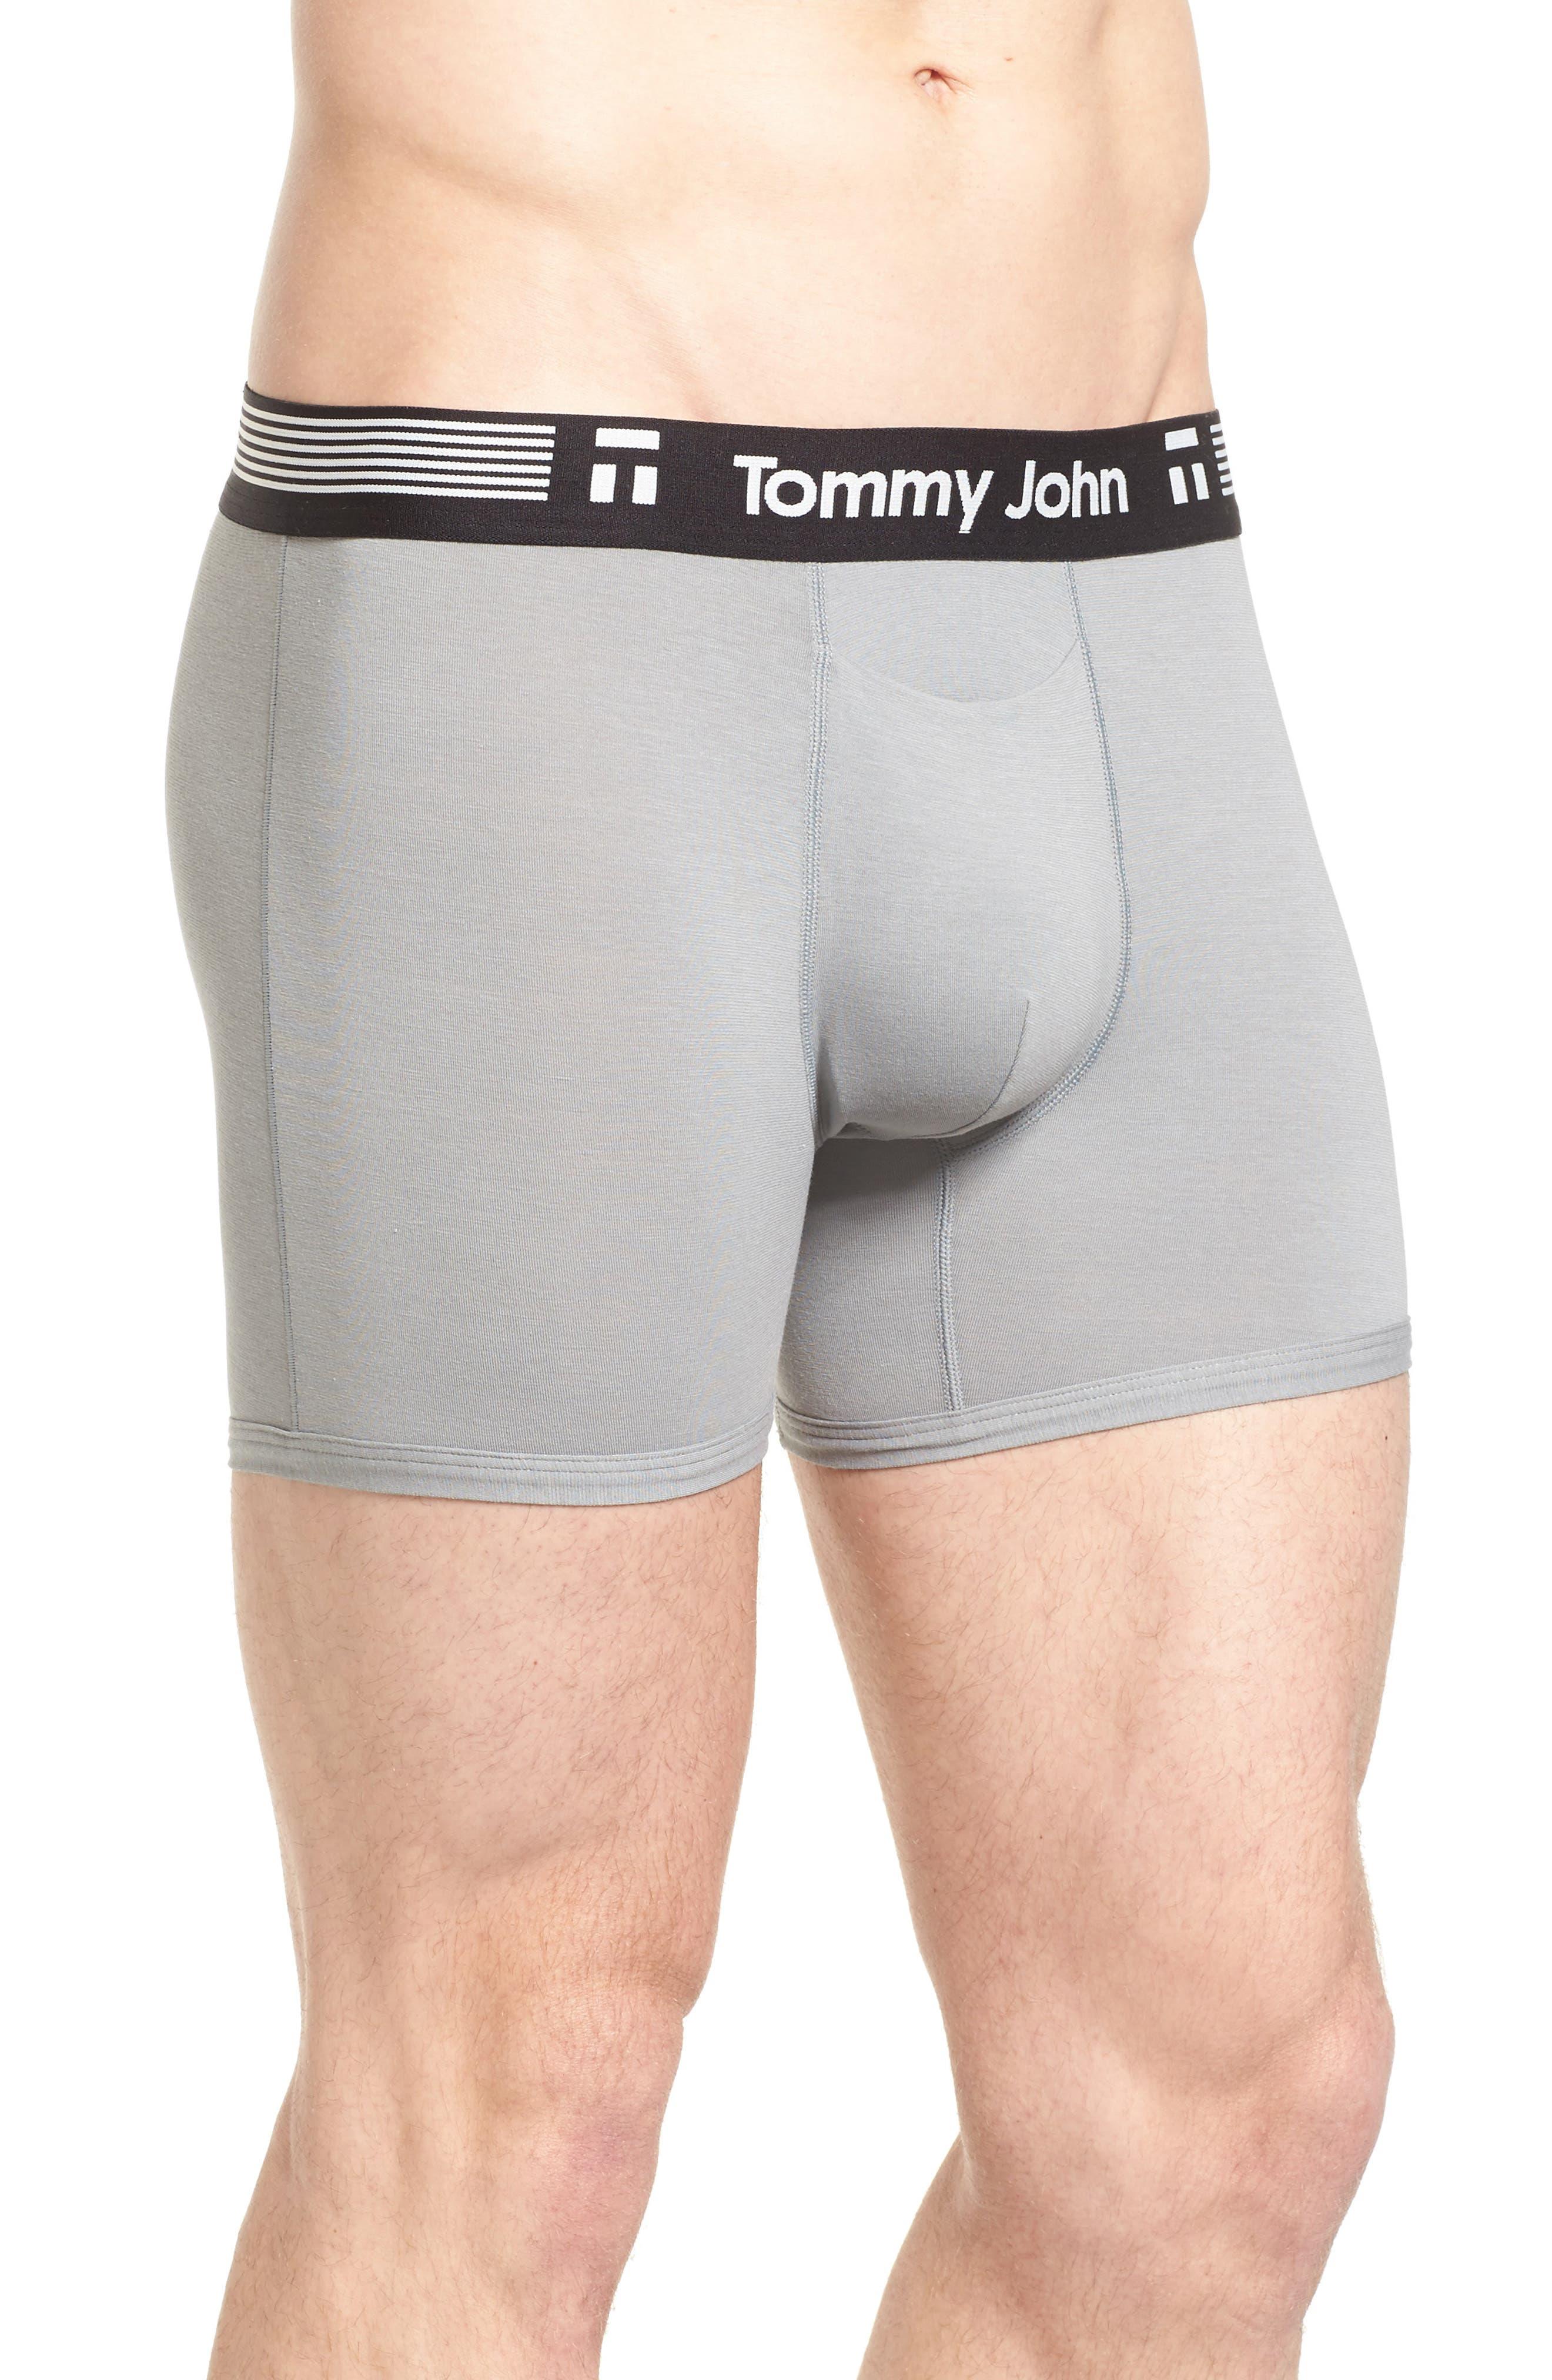 TOMMY JOHN,                             Cool Cotton Trunks,                             Alternate thumbnail 3, color,                             GREY